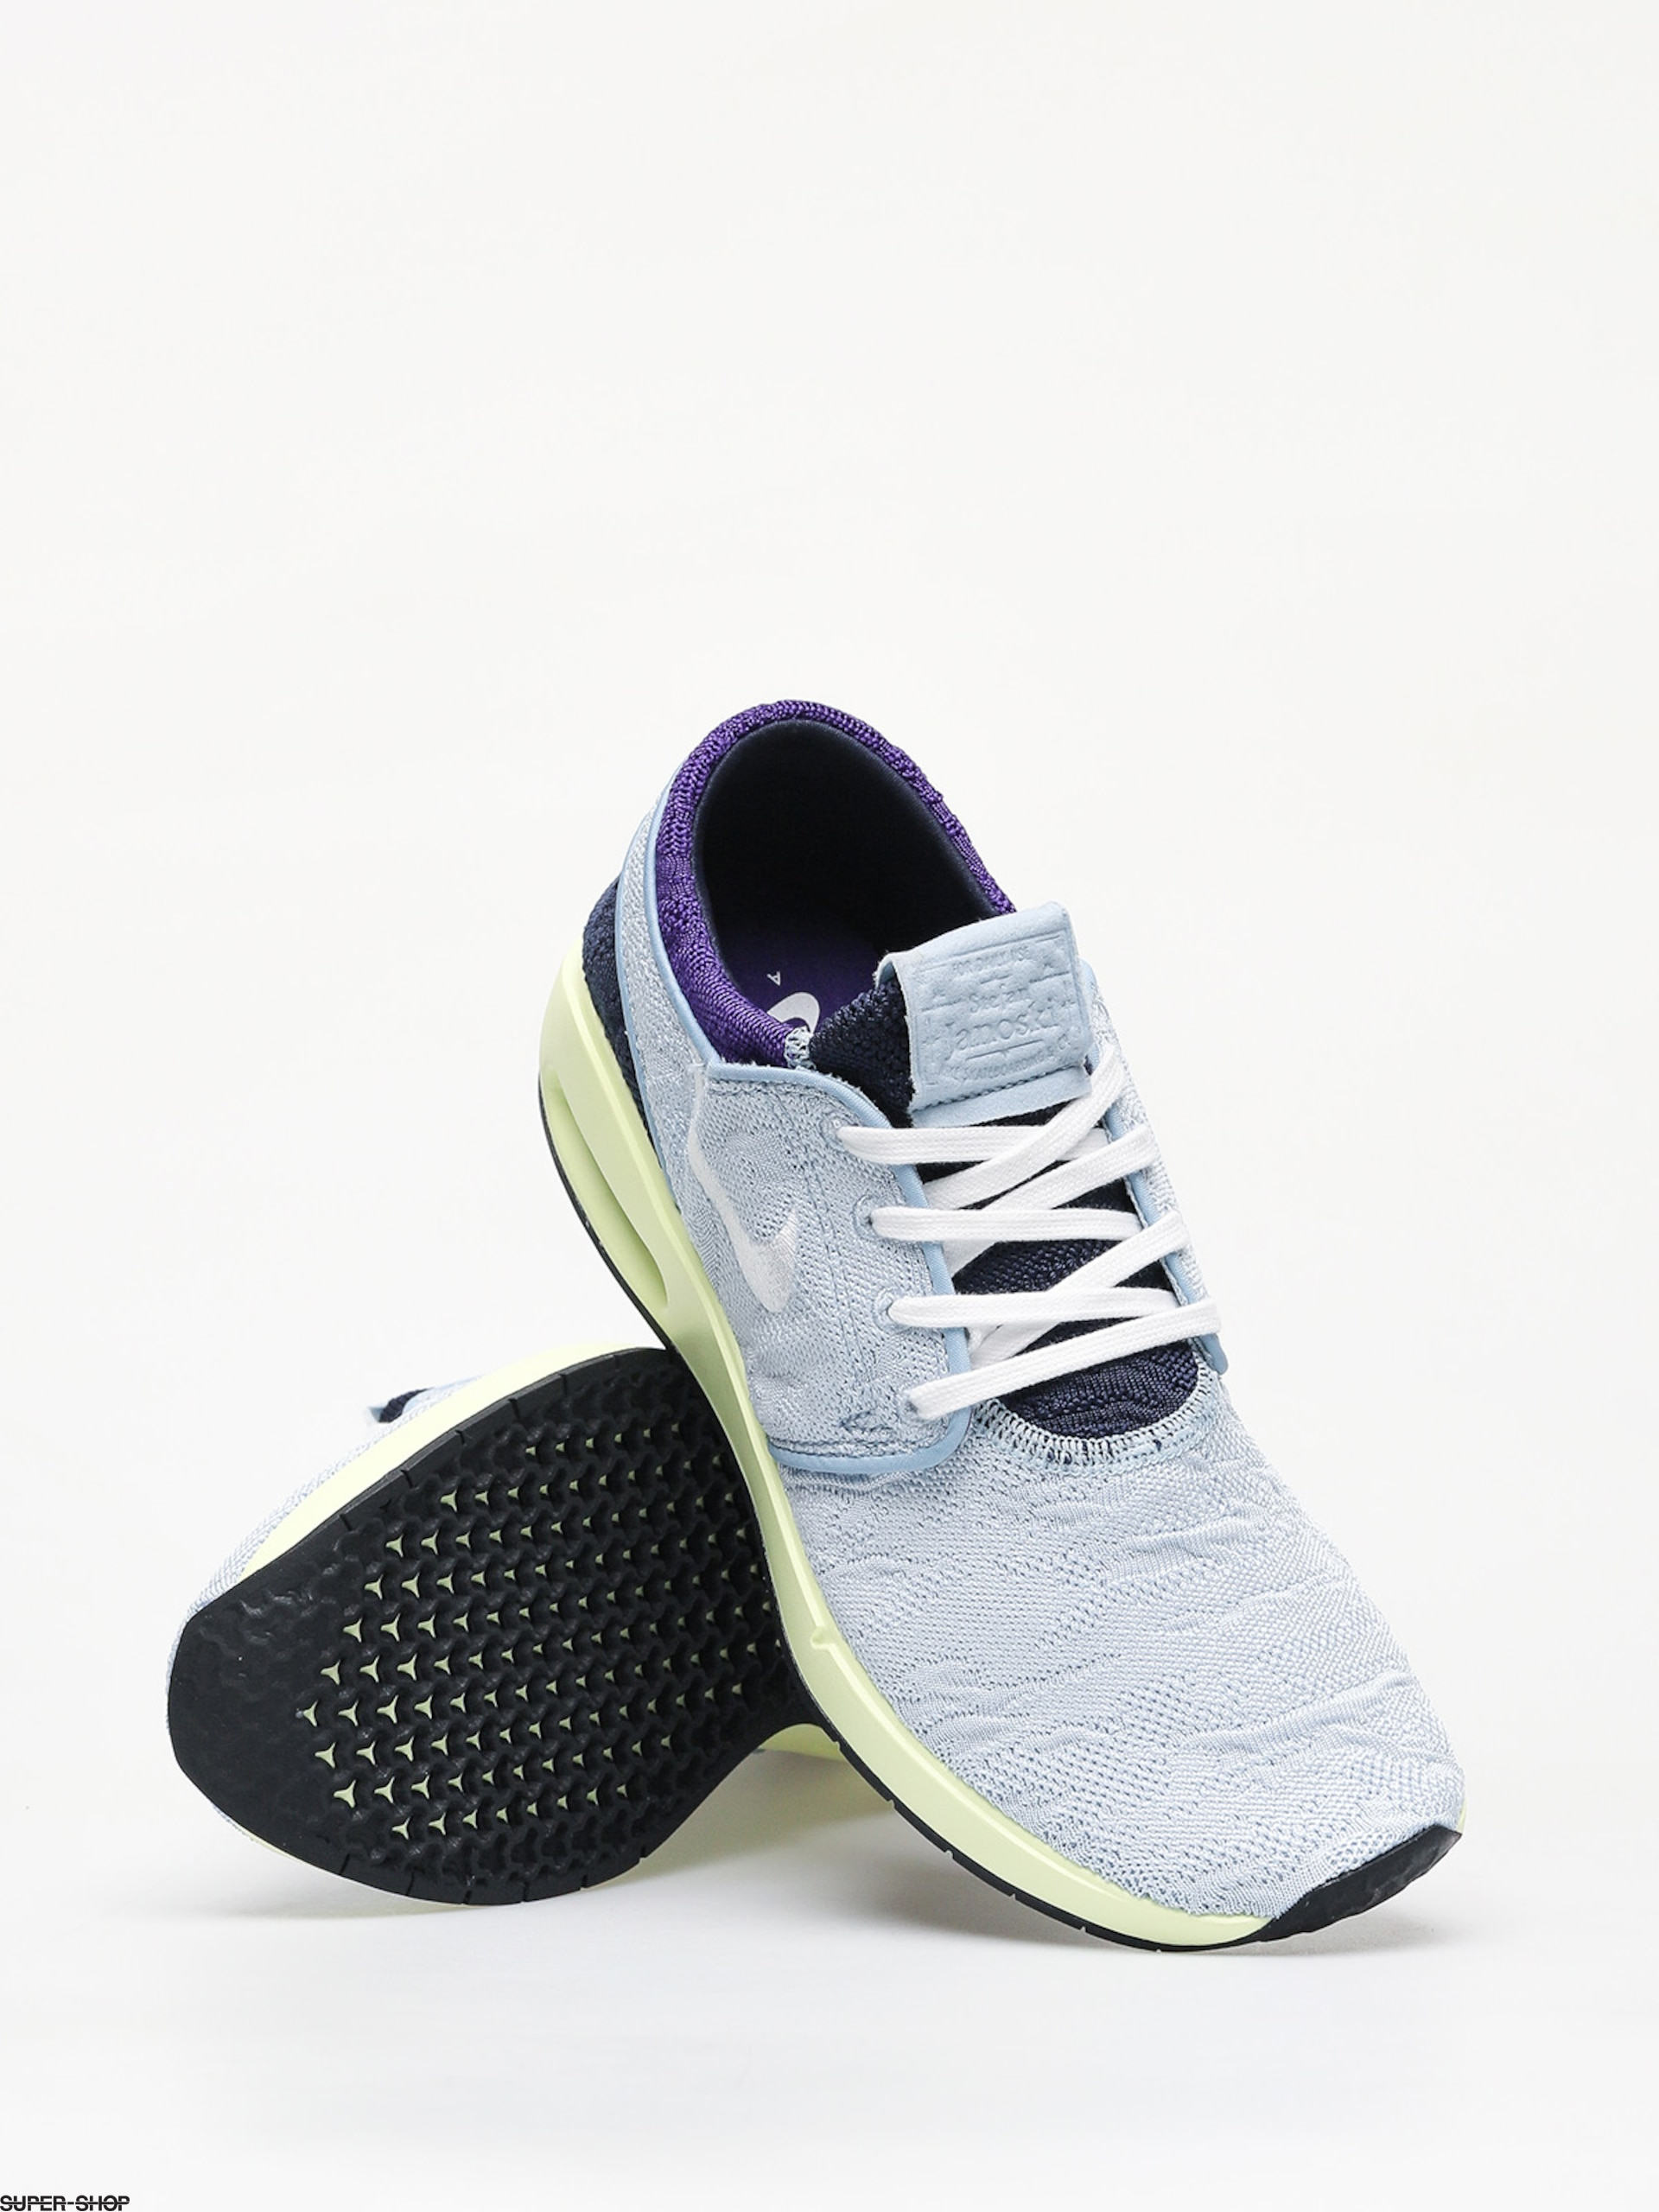 Nike SB Air Max Janoski 2 Shoes (lt armory blue/white midnight navy)